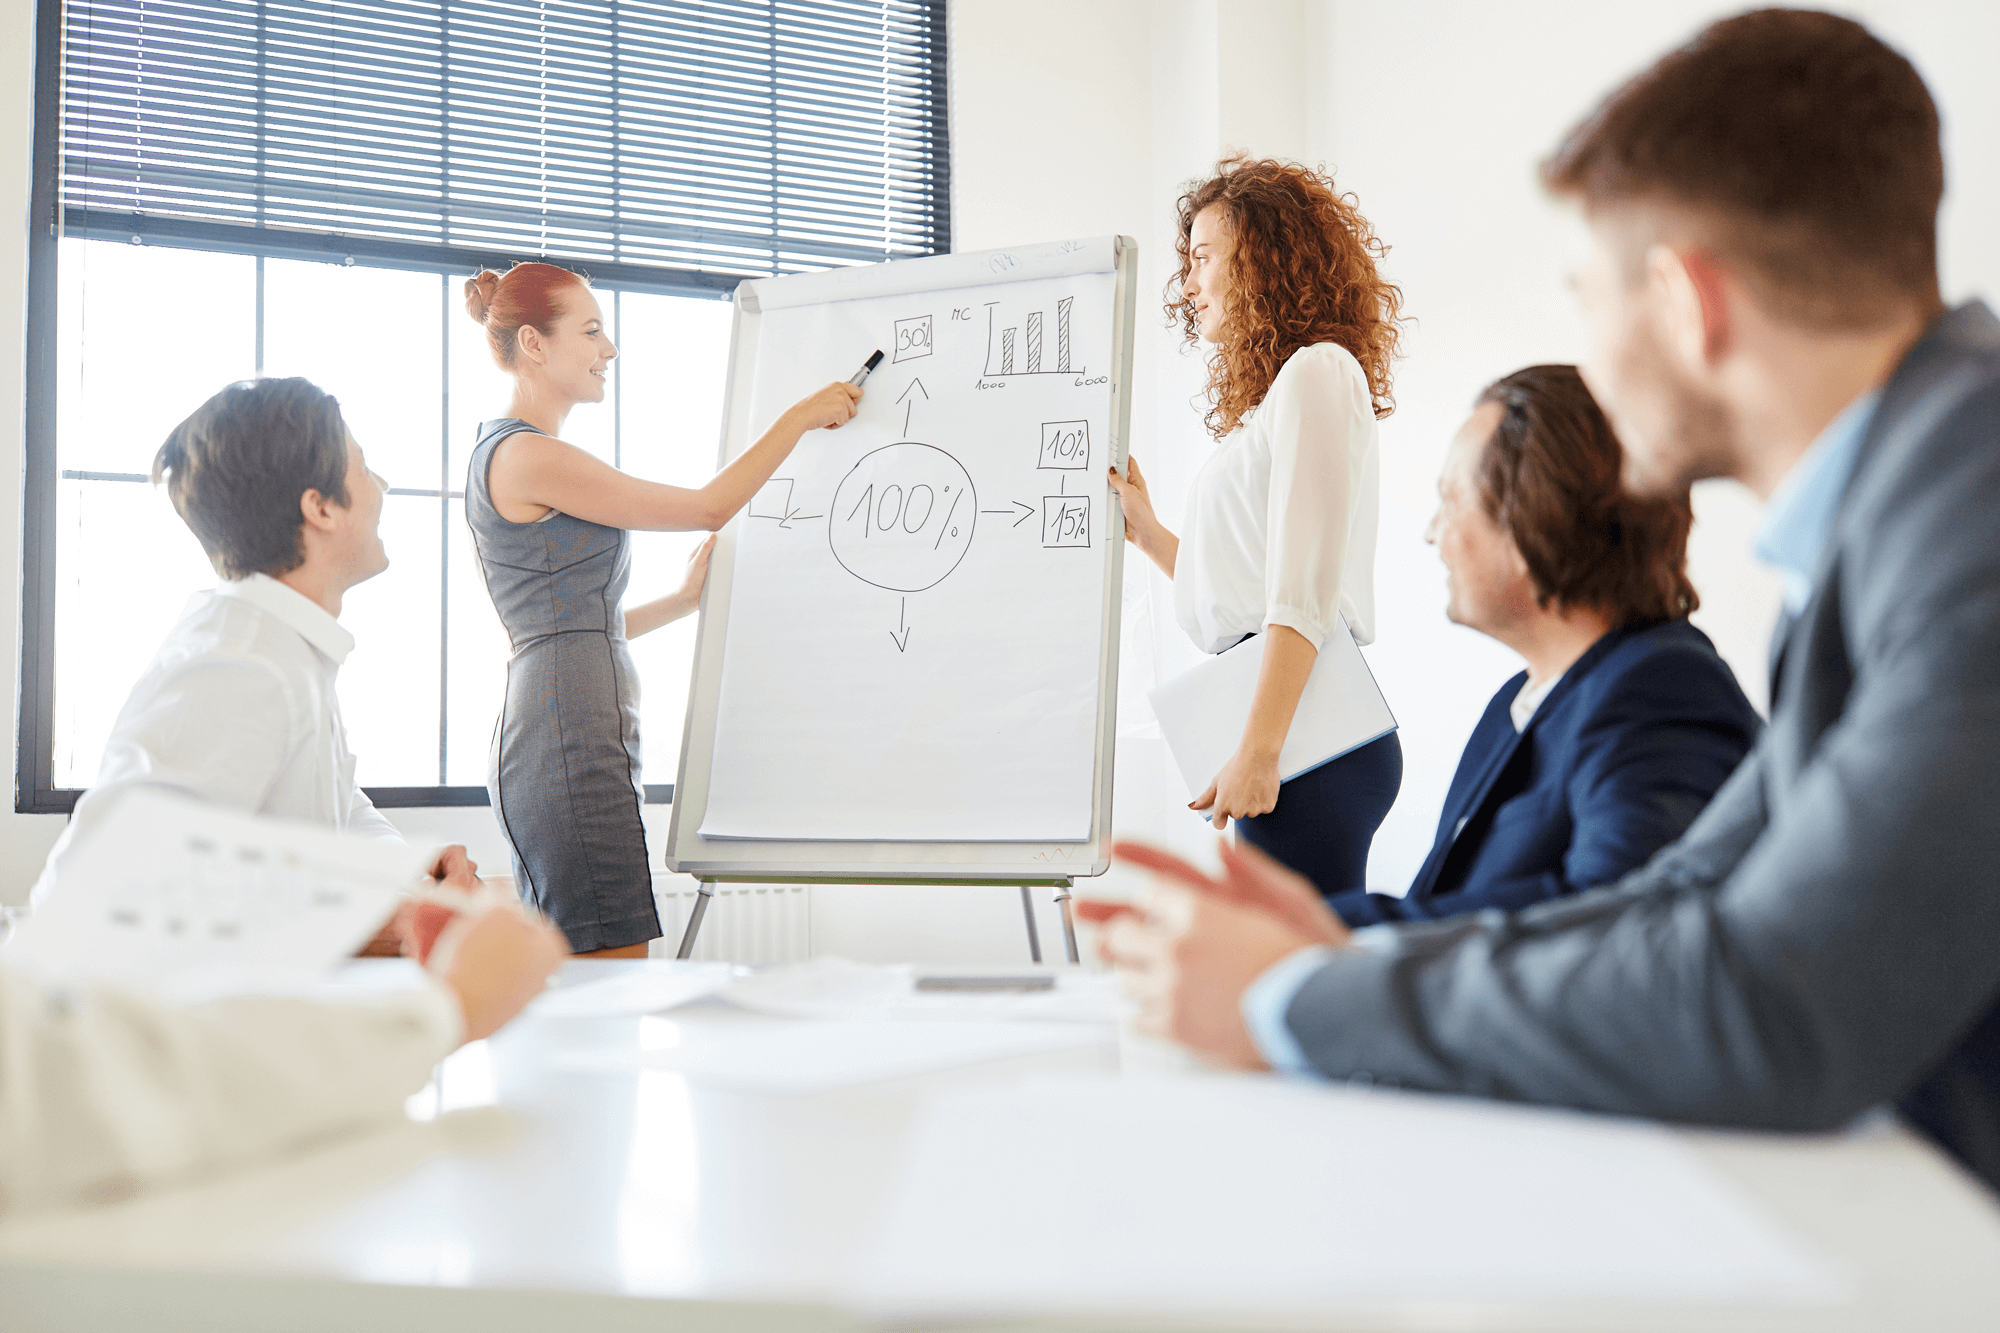 Strategie | Datagedreven werken | Bedrijfsstrategie | 5 stappen